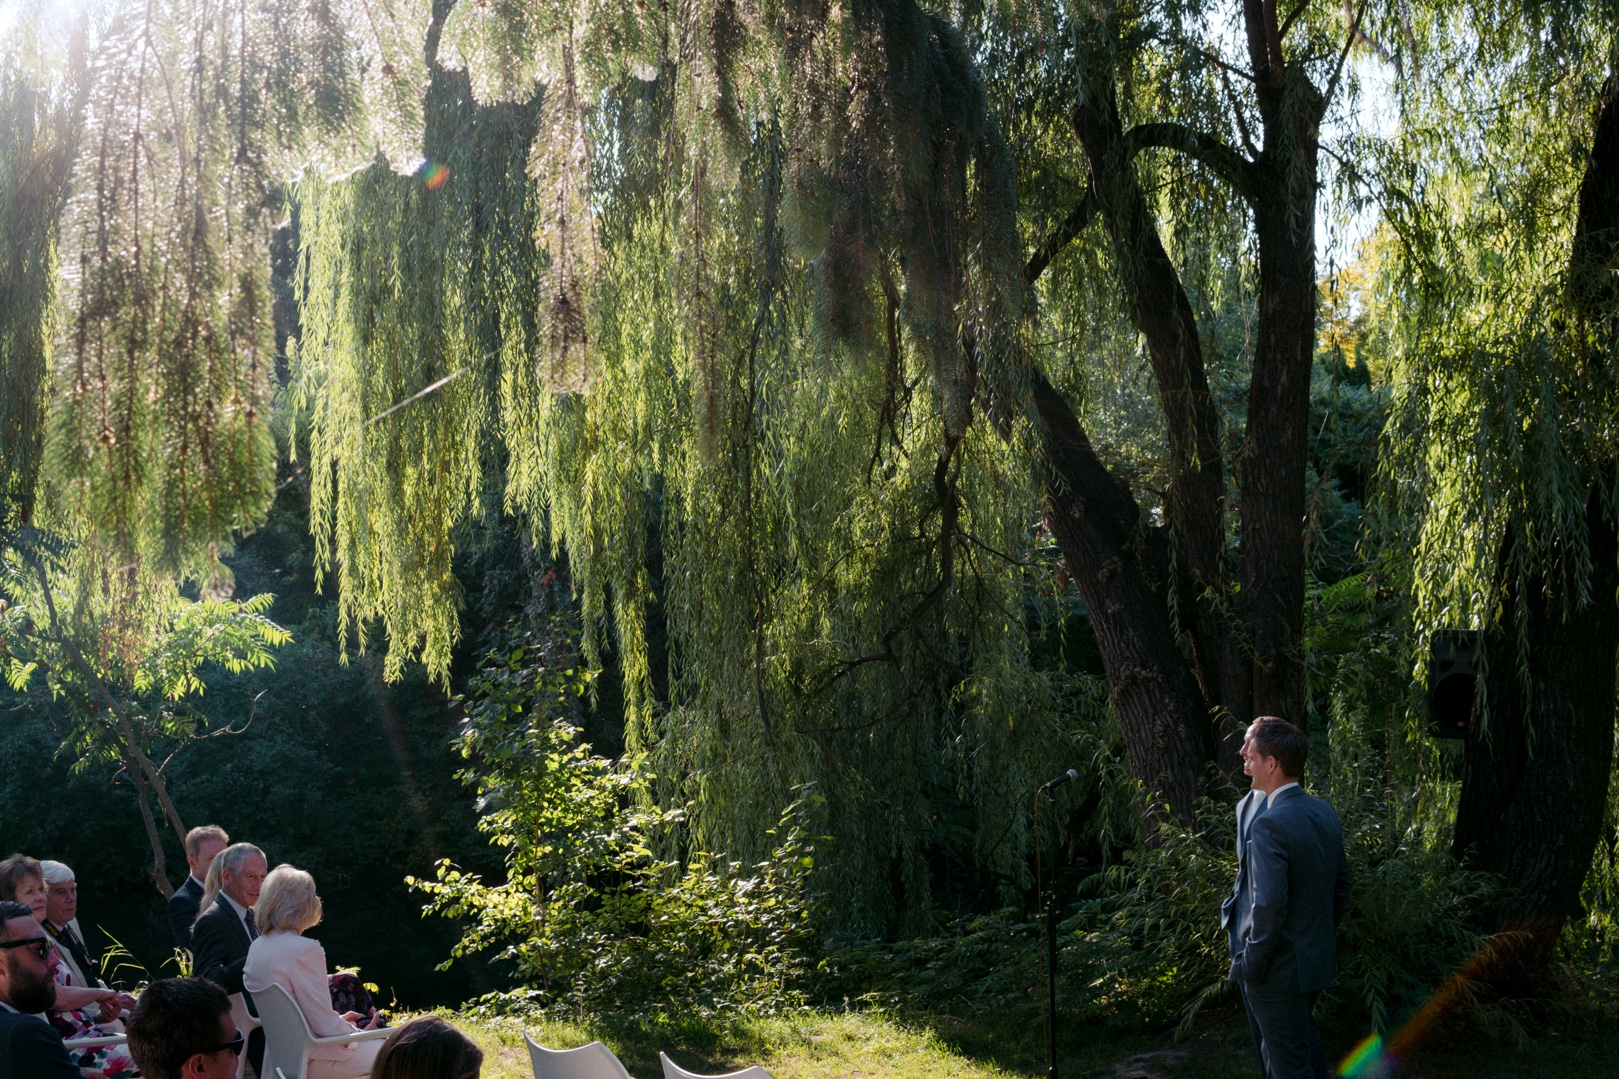 39_JACQUELINE RICH WEDDING AJ-143_Events_Weddings_2018_Travel_Engagement_Photography_best_Portraits.jpg